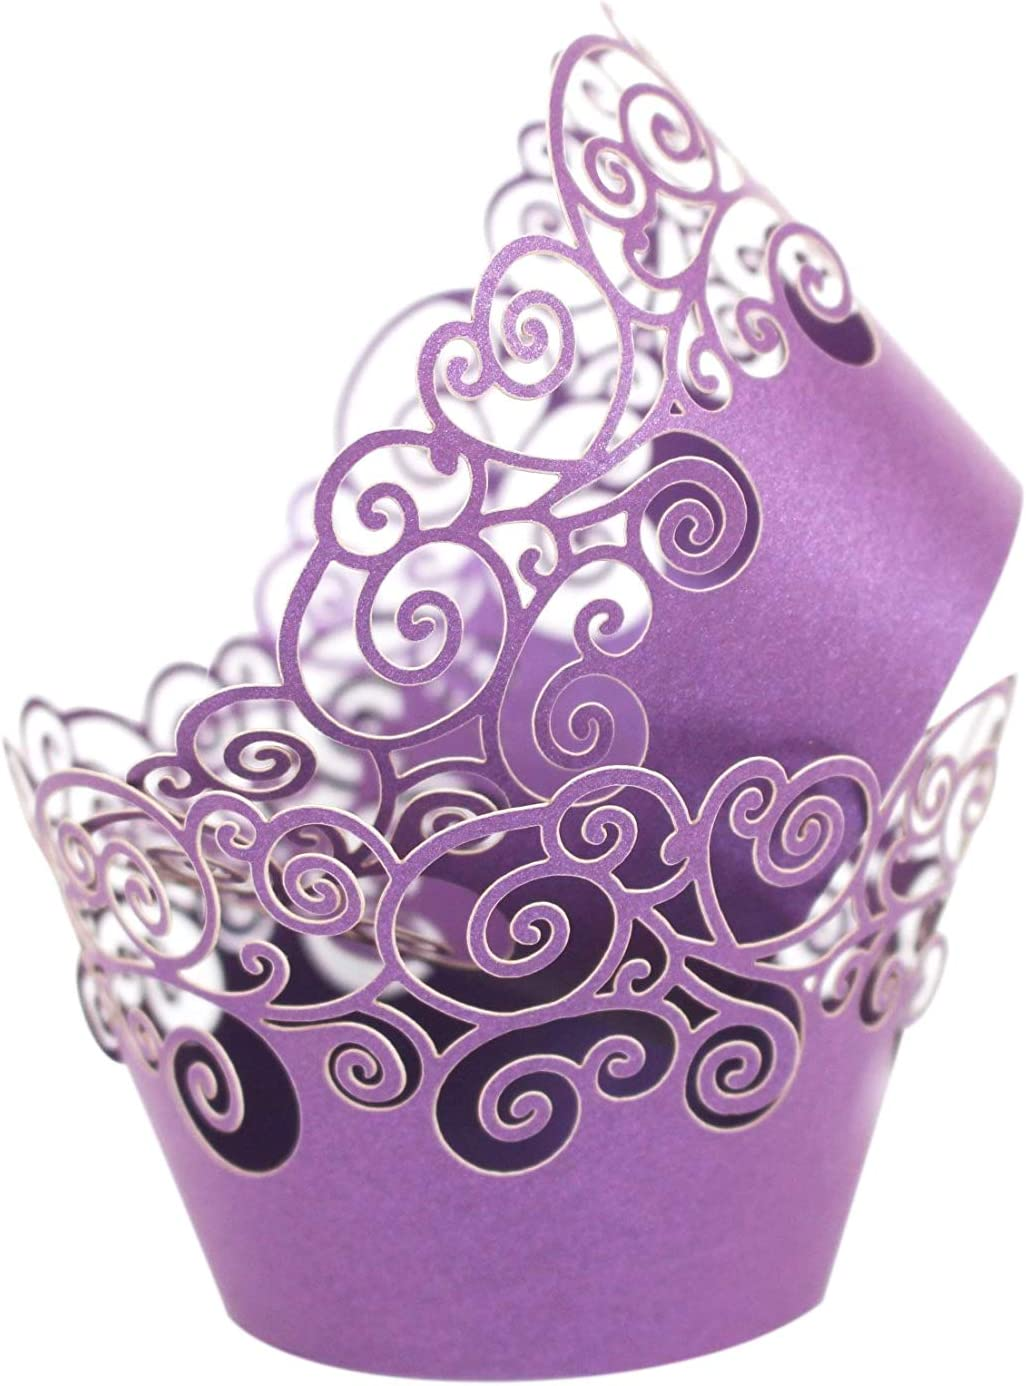 KPOSIYA Cupcake Wrappers 60 Filigree Artistic Bake Cu Paper Max 73% Superior OFF Cake